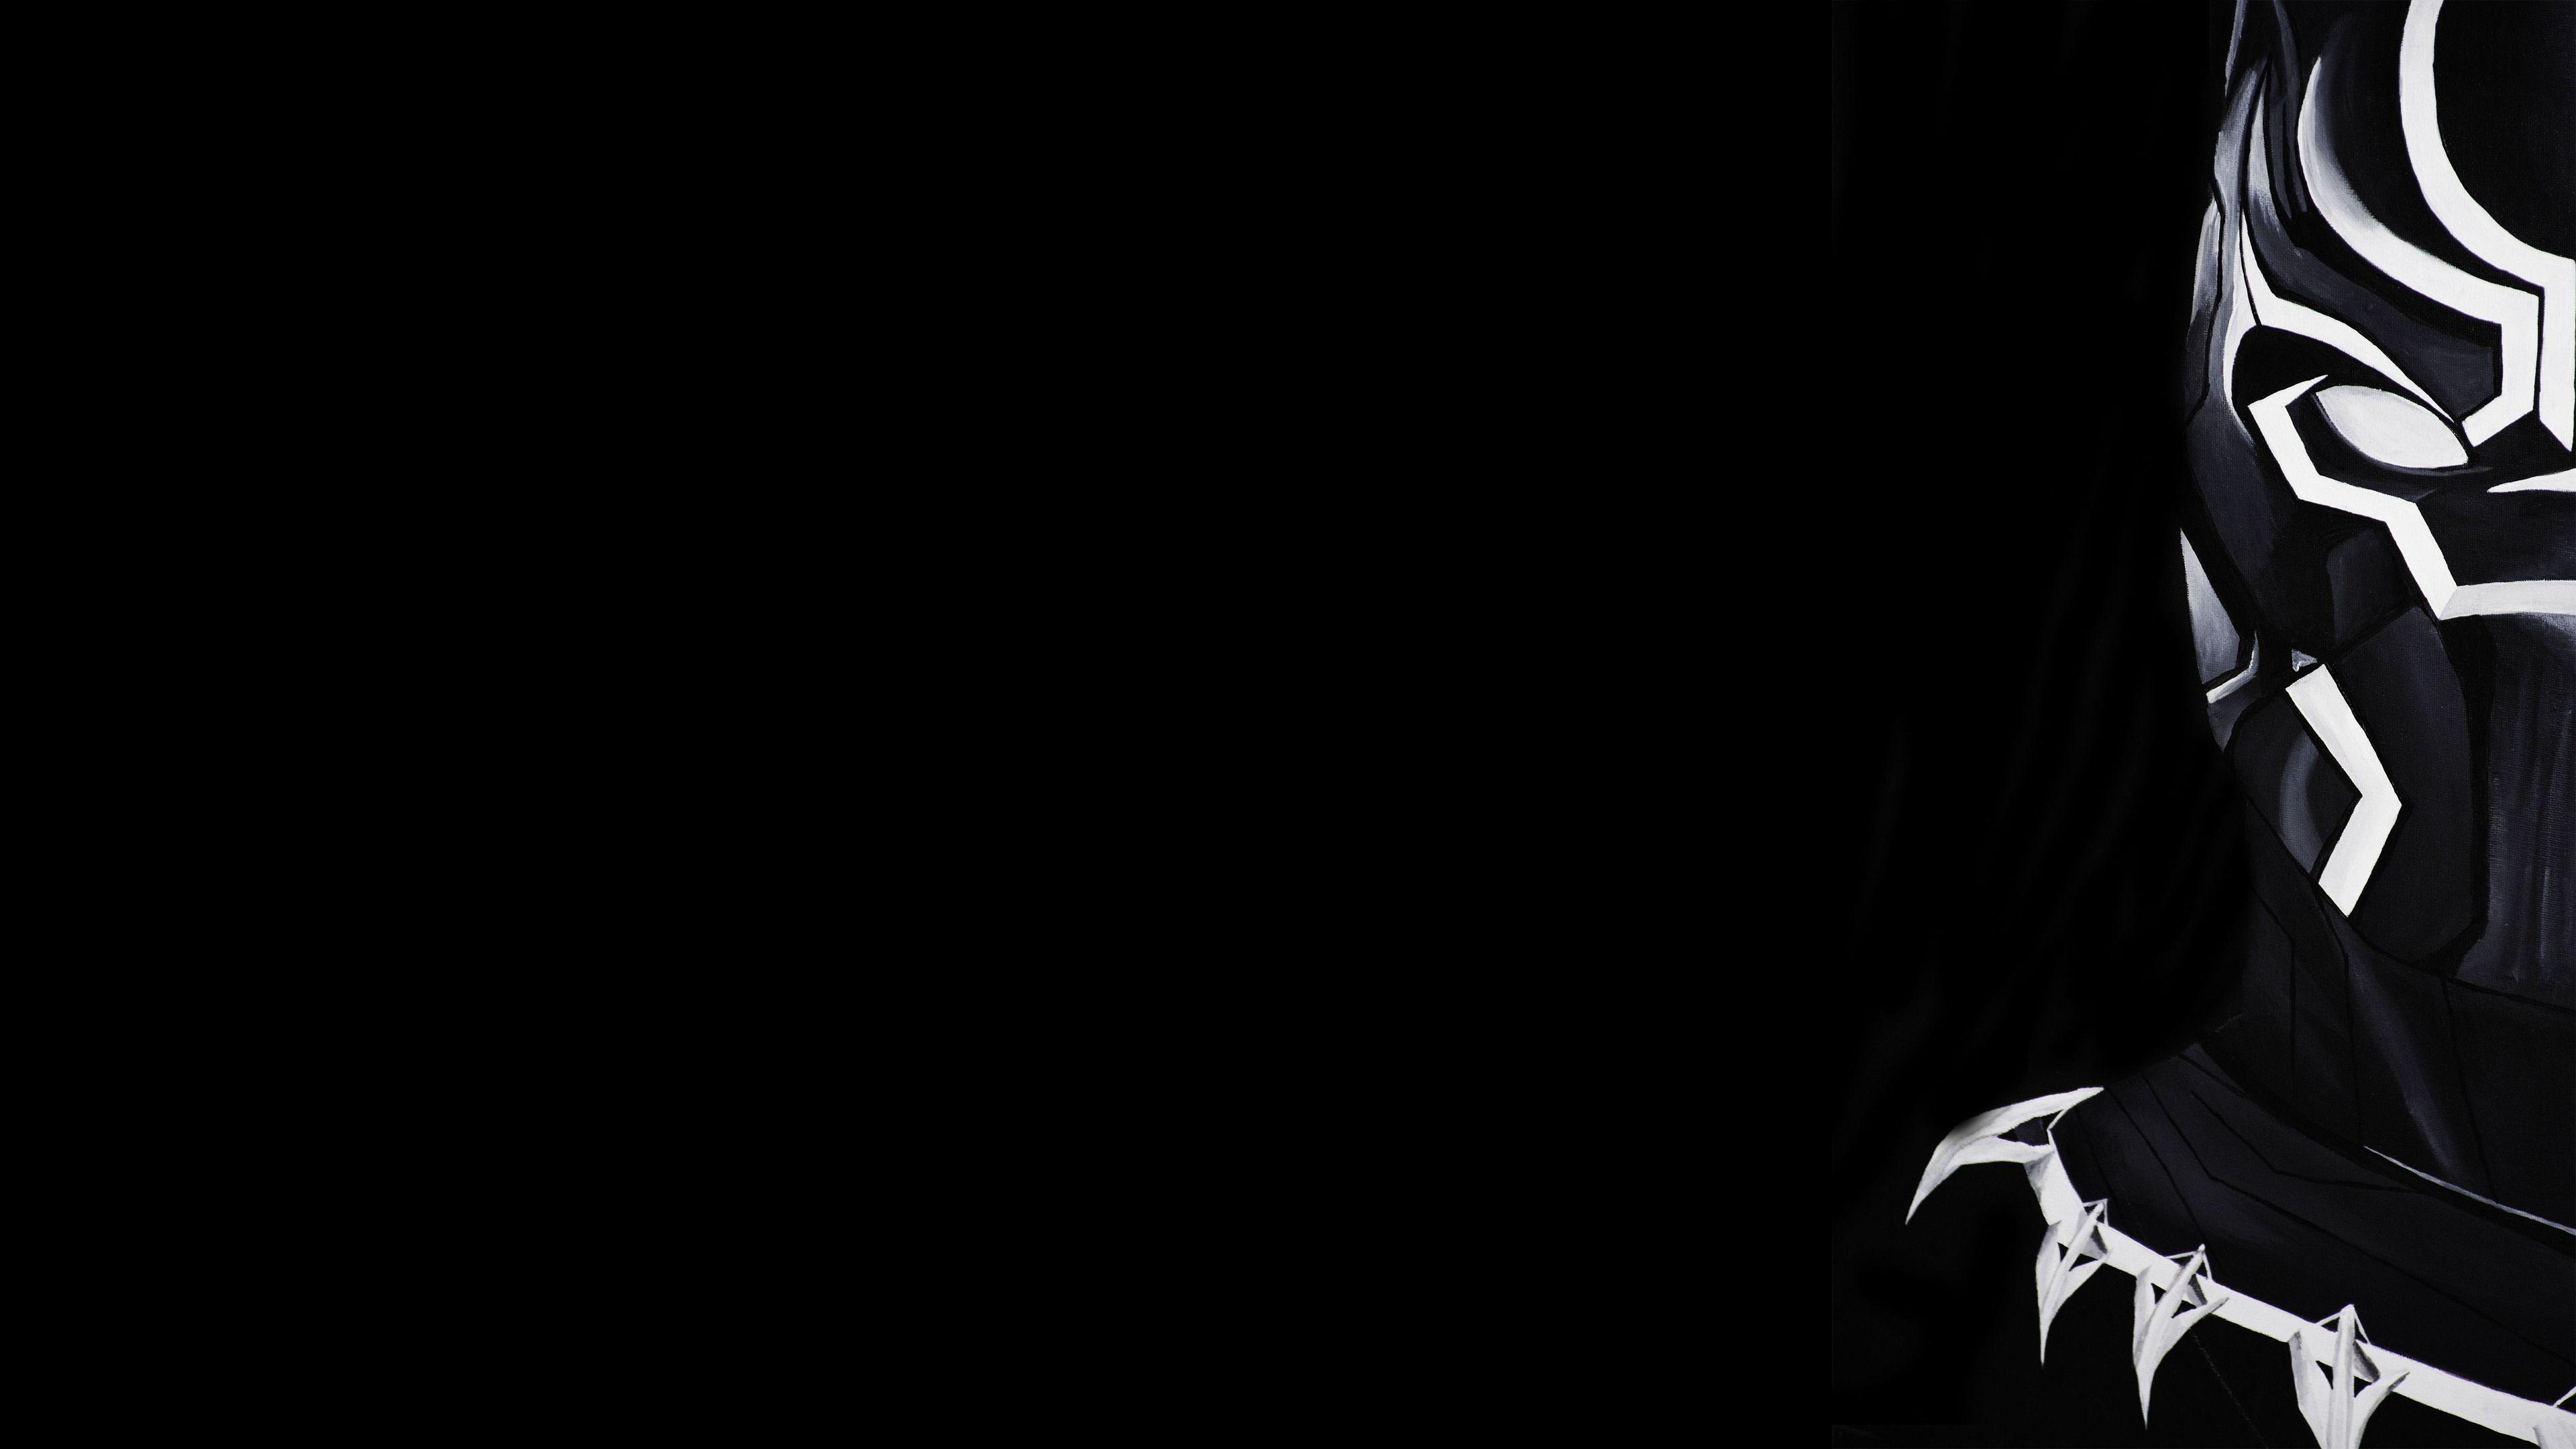 Black Panther 4K Ultra HD Dark Wallpapers - Top Free Black ...